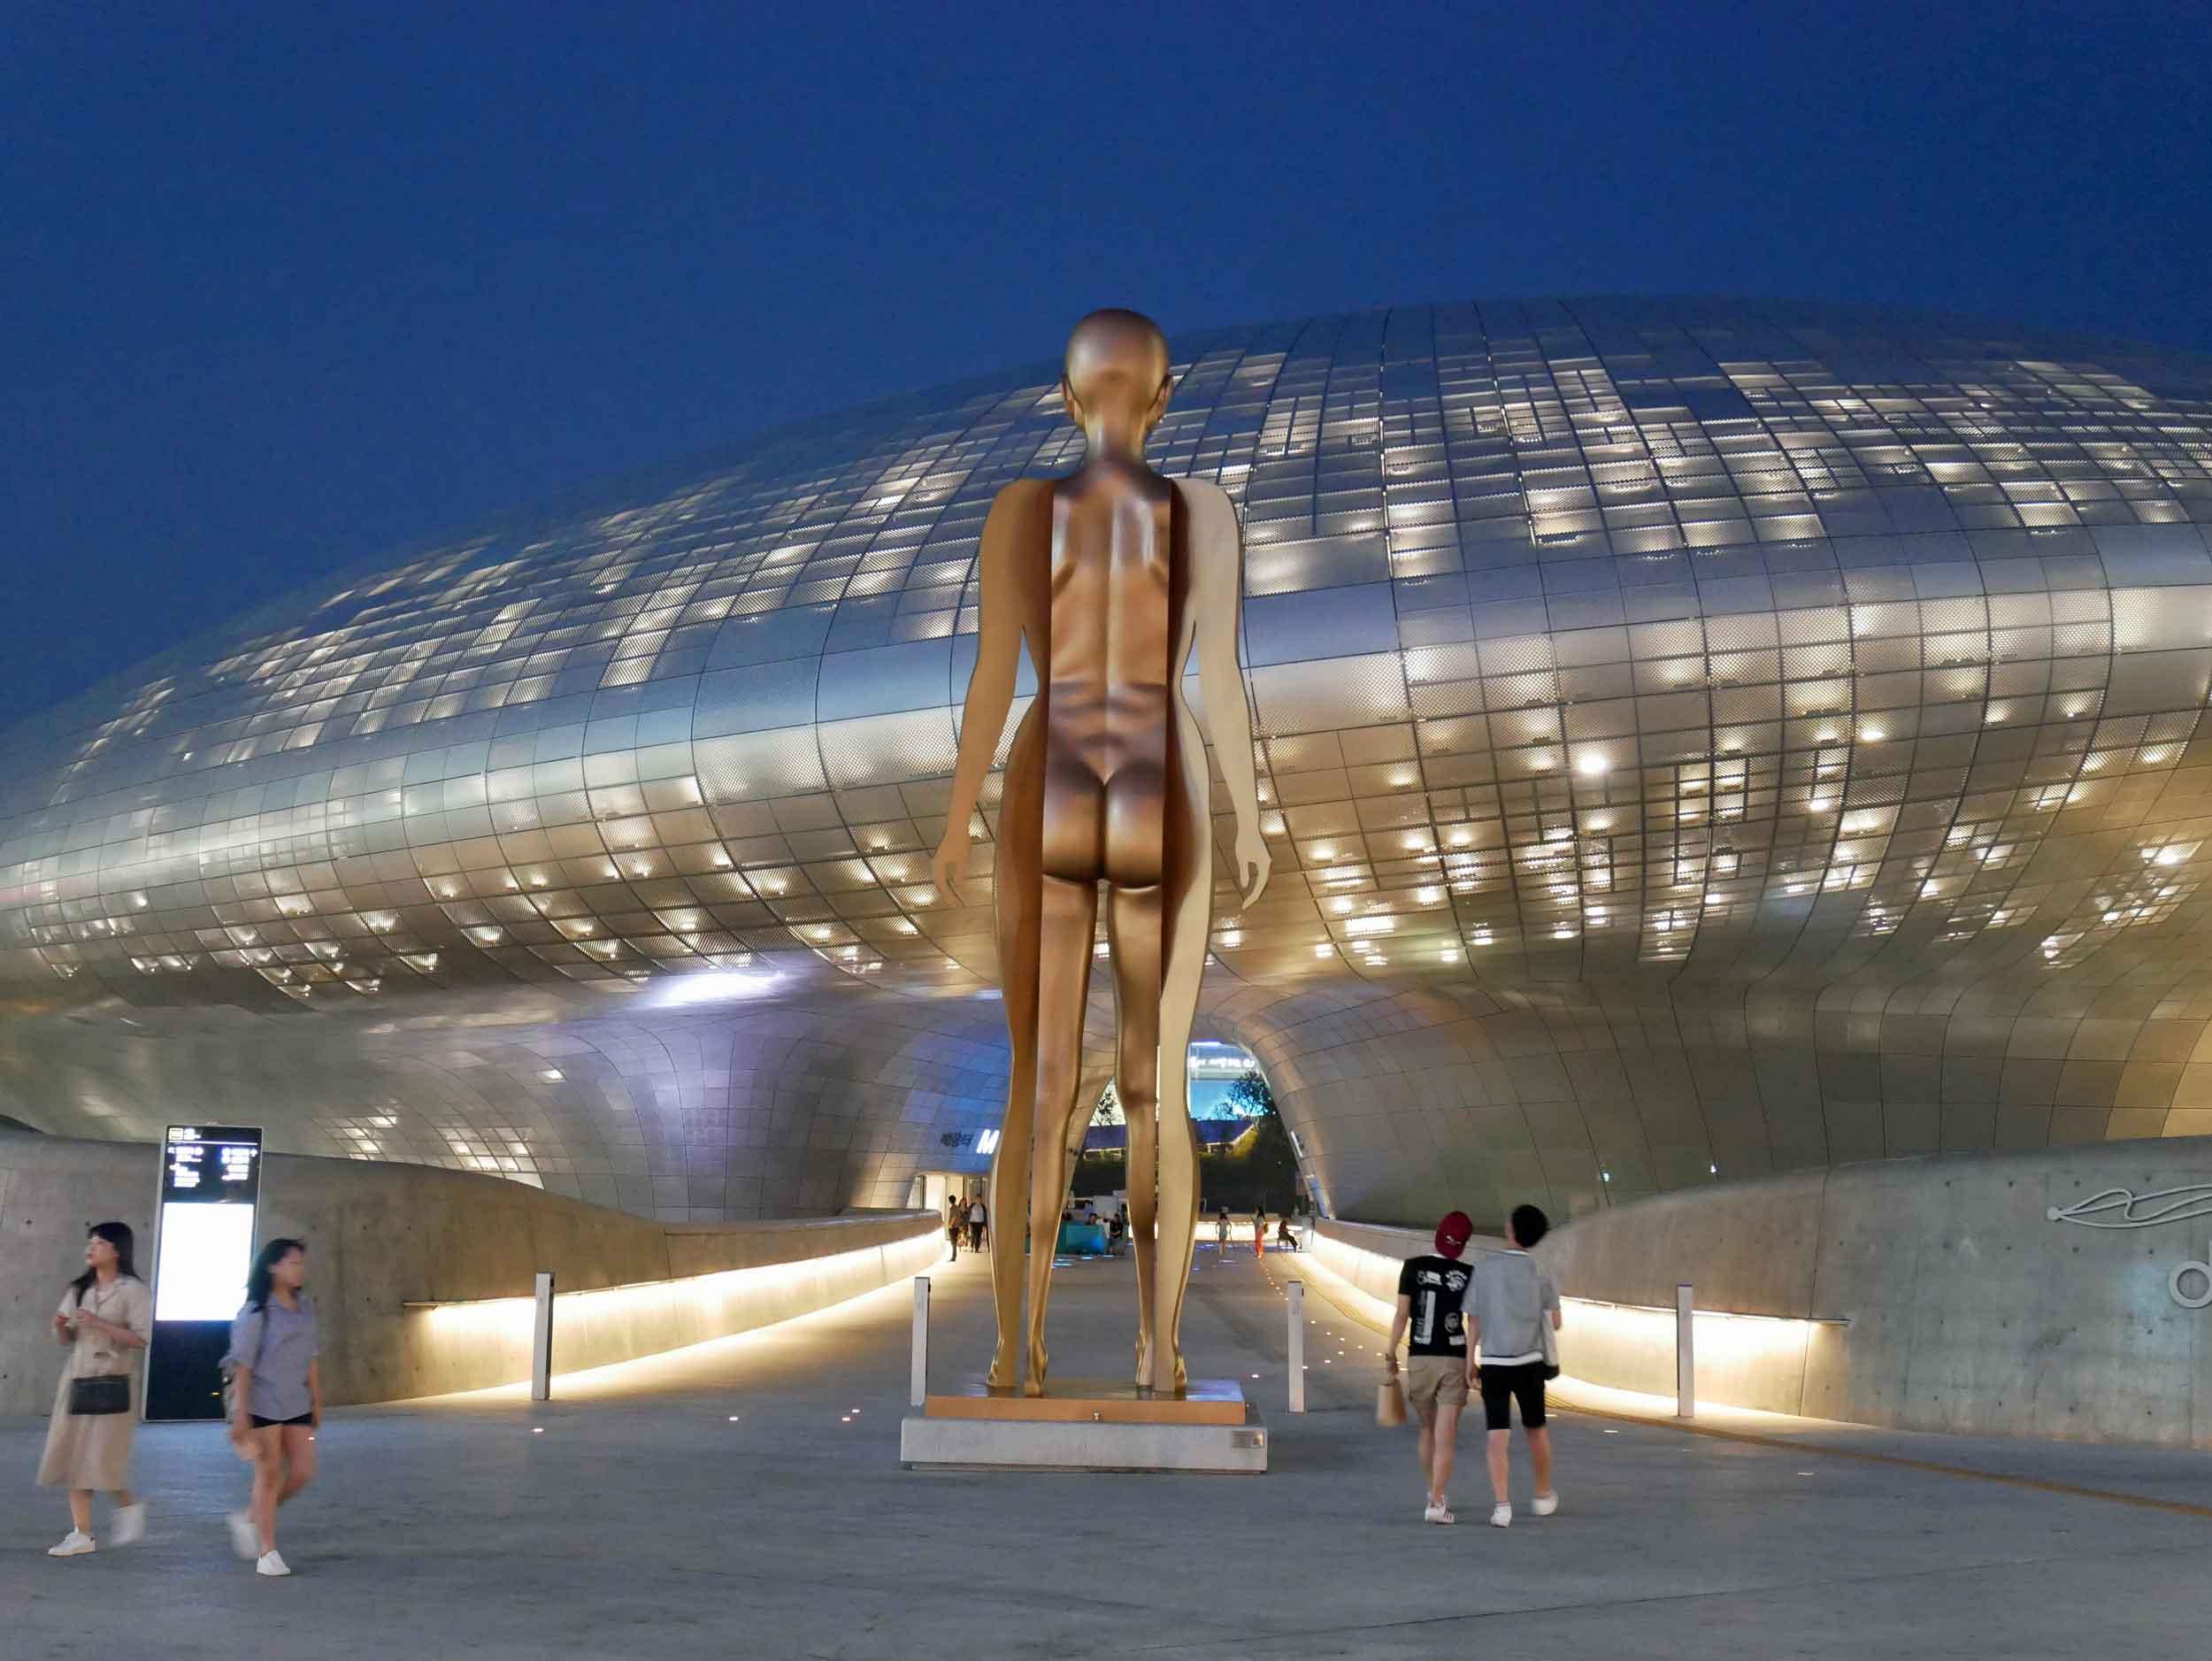 The spaceship-like DDP, designed by famed architect Zaha Hadid.